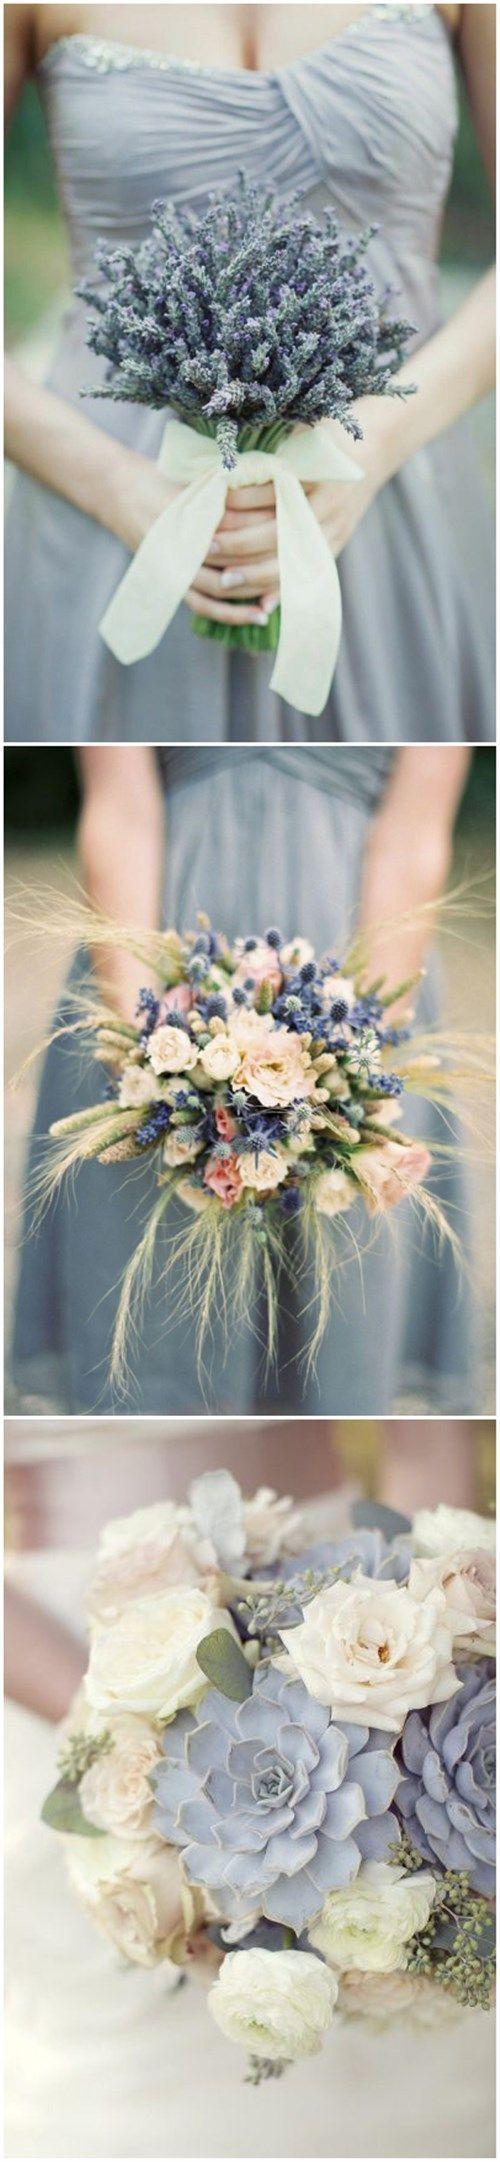 Dusty Blue Wedding Bouquets : Slate and dusty blue wedding ideas flower